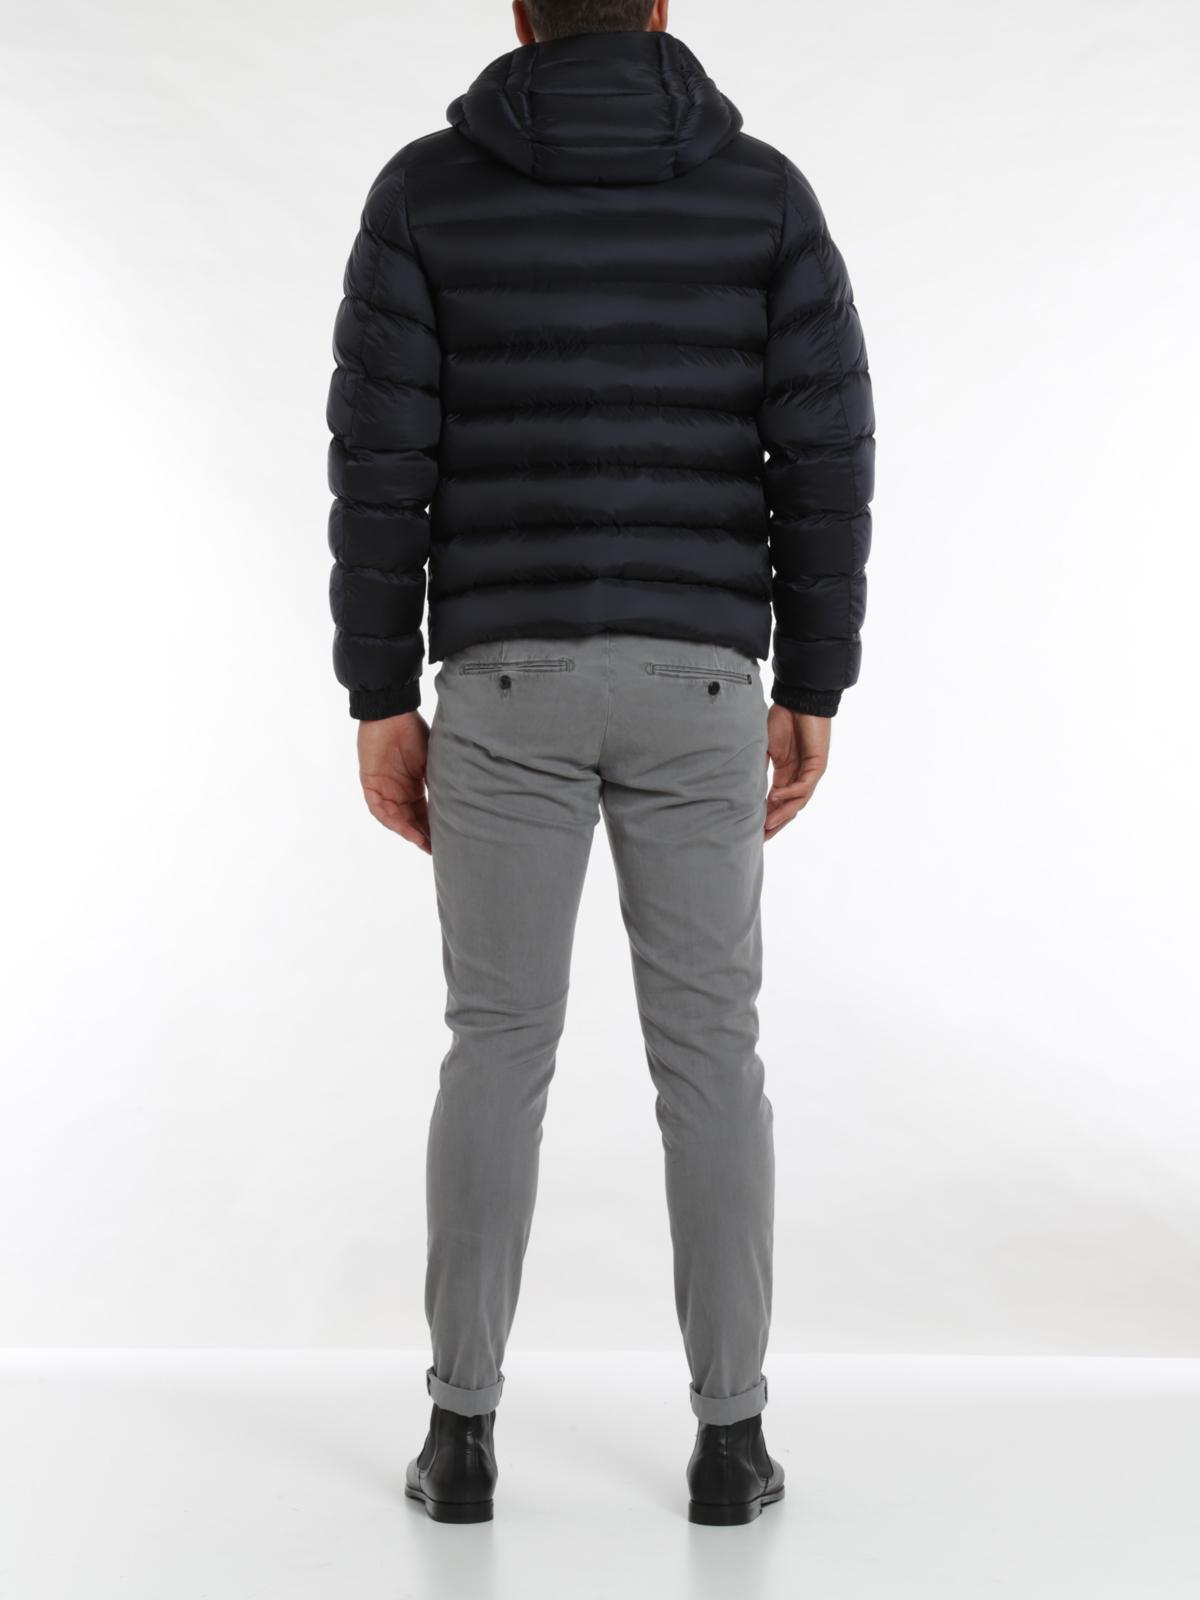 edward down jacket by moncler padded jackets shop online at a2 091 4199349 53334 742. Black Bedroom Furniture Sets. Home Design Ideas